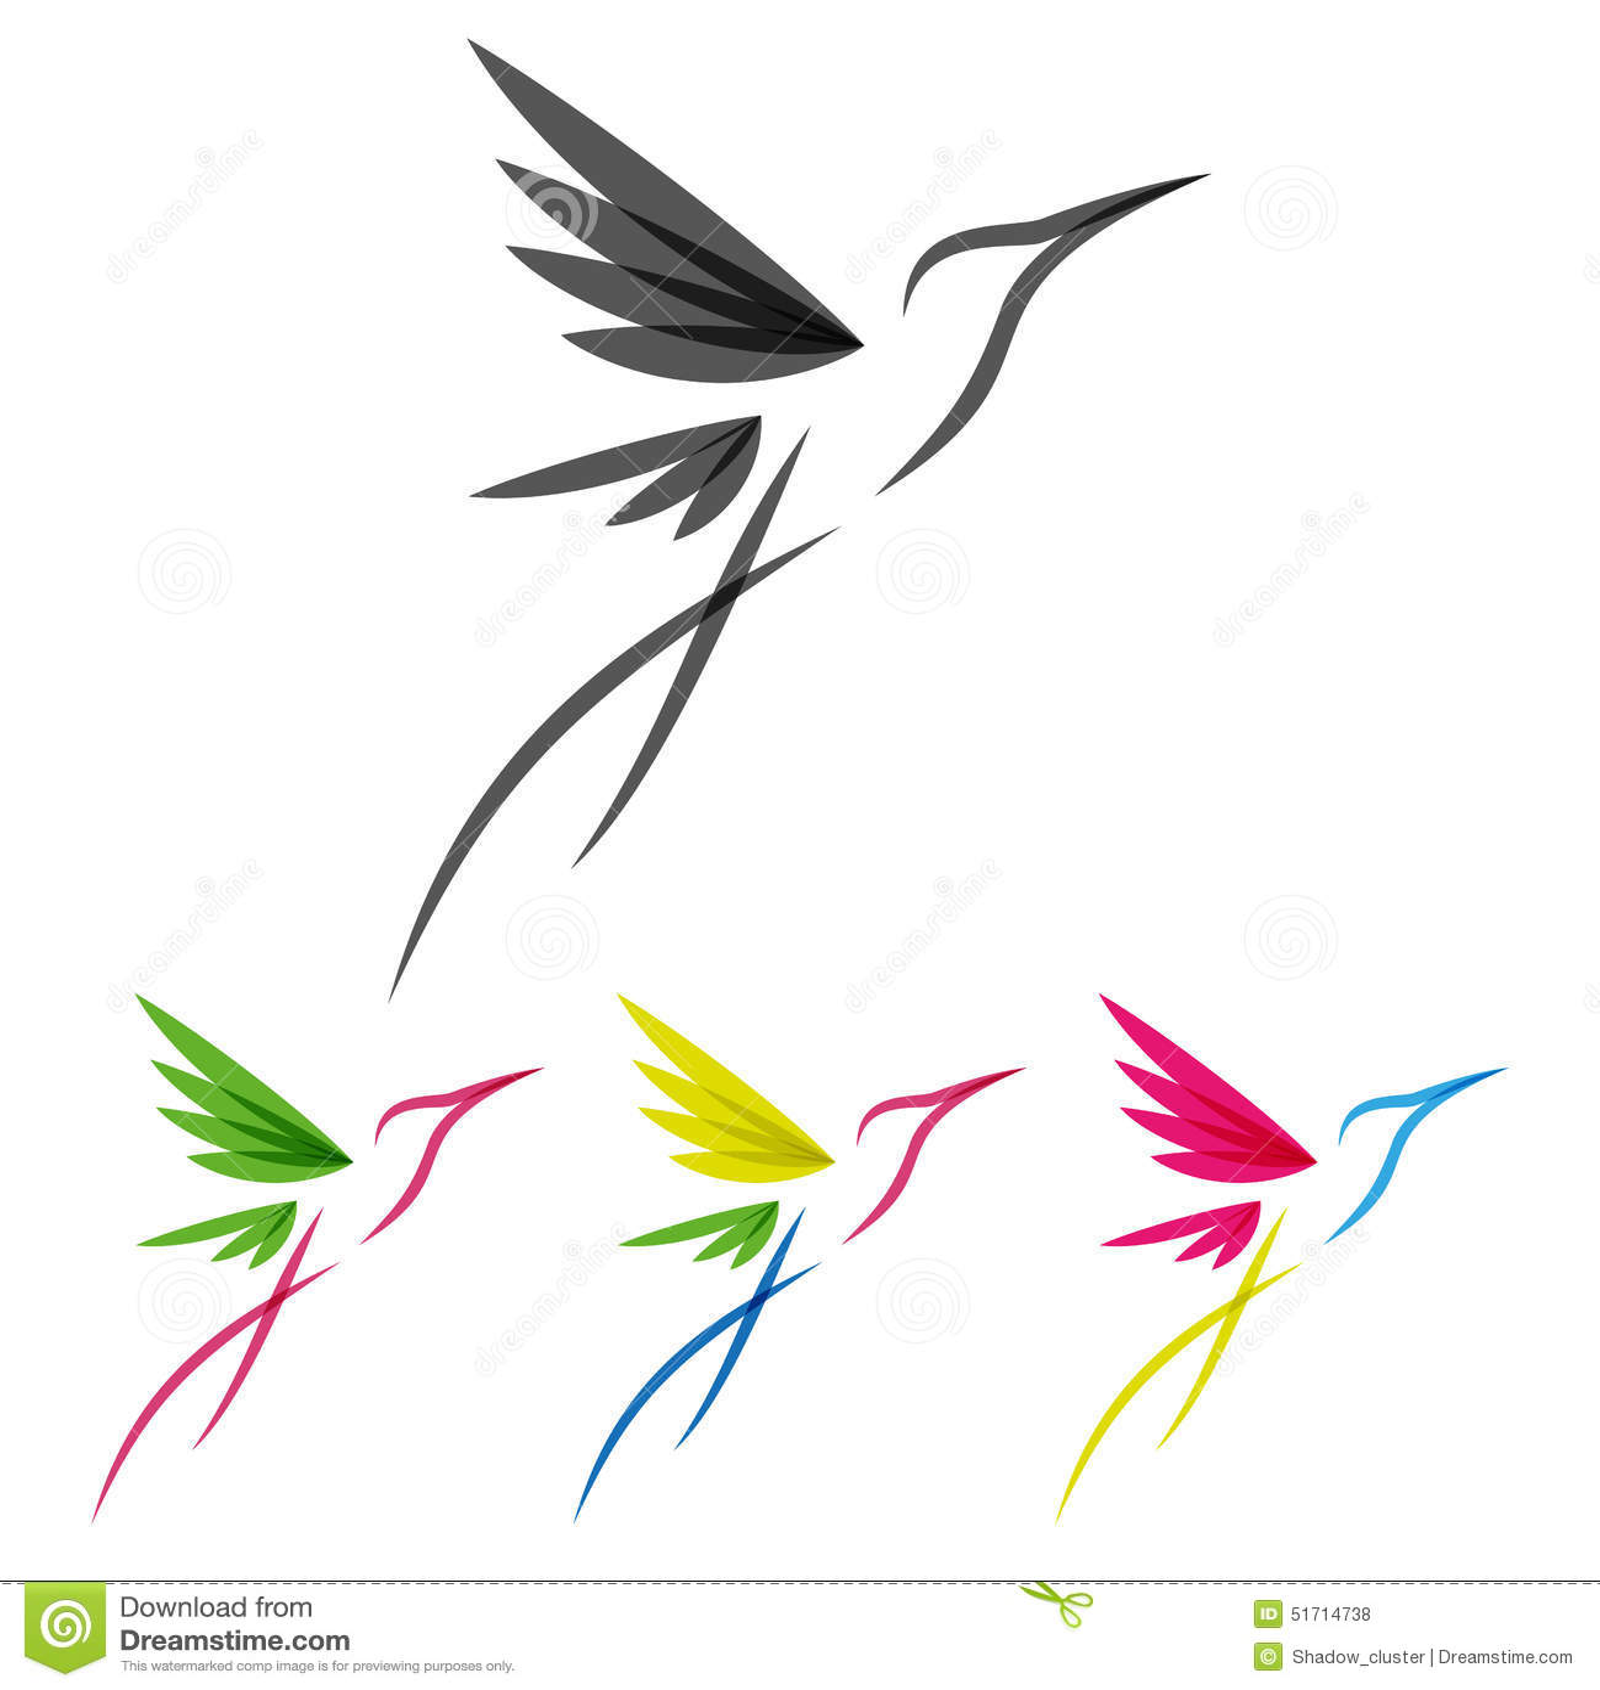 tiny bird clip art